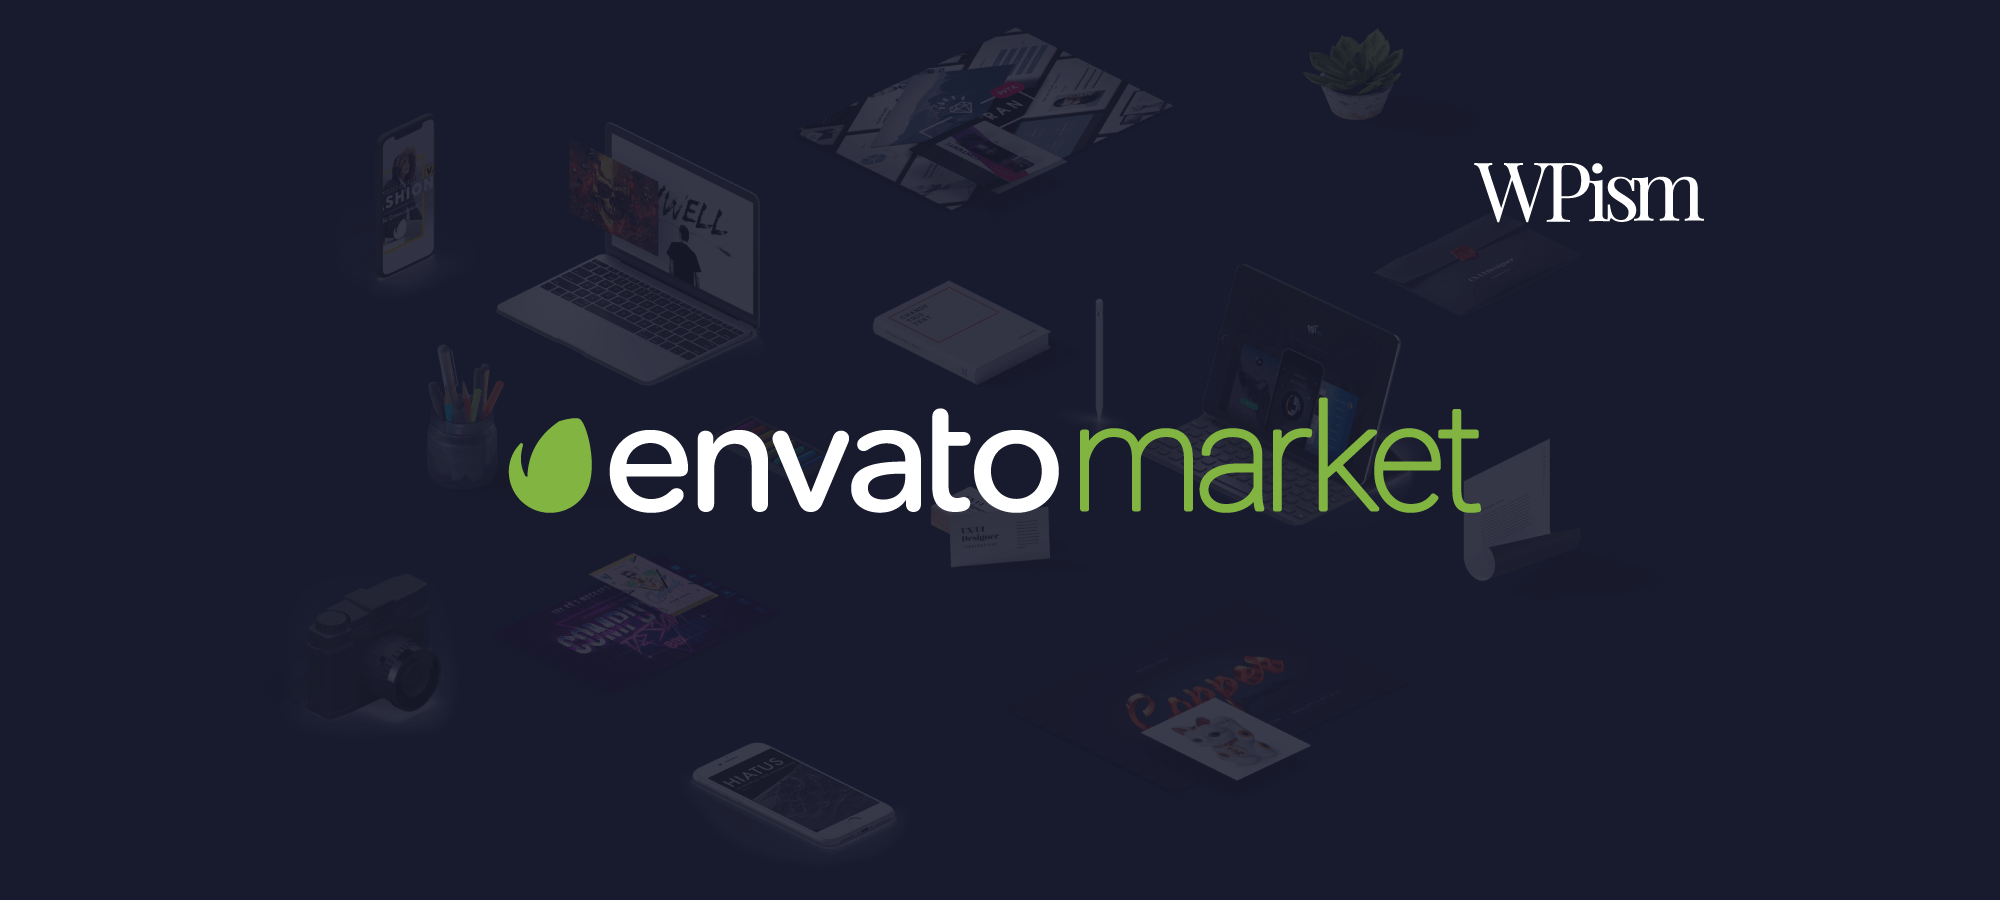 [Image: Envato-Market-Coupon-Code-Deal-ThemeForest-WPism-.png]